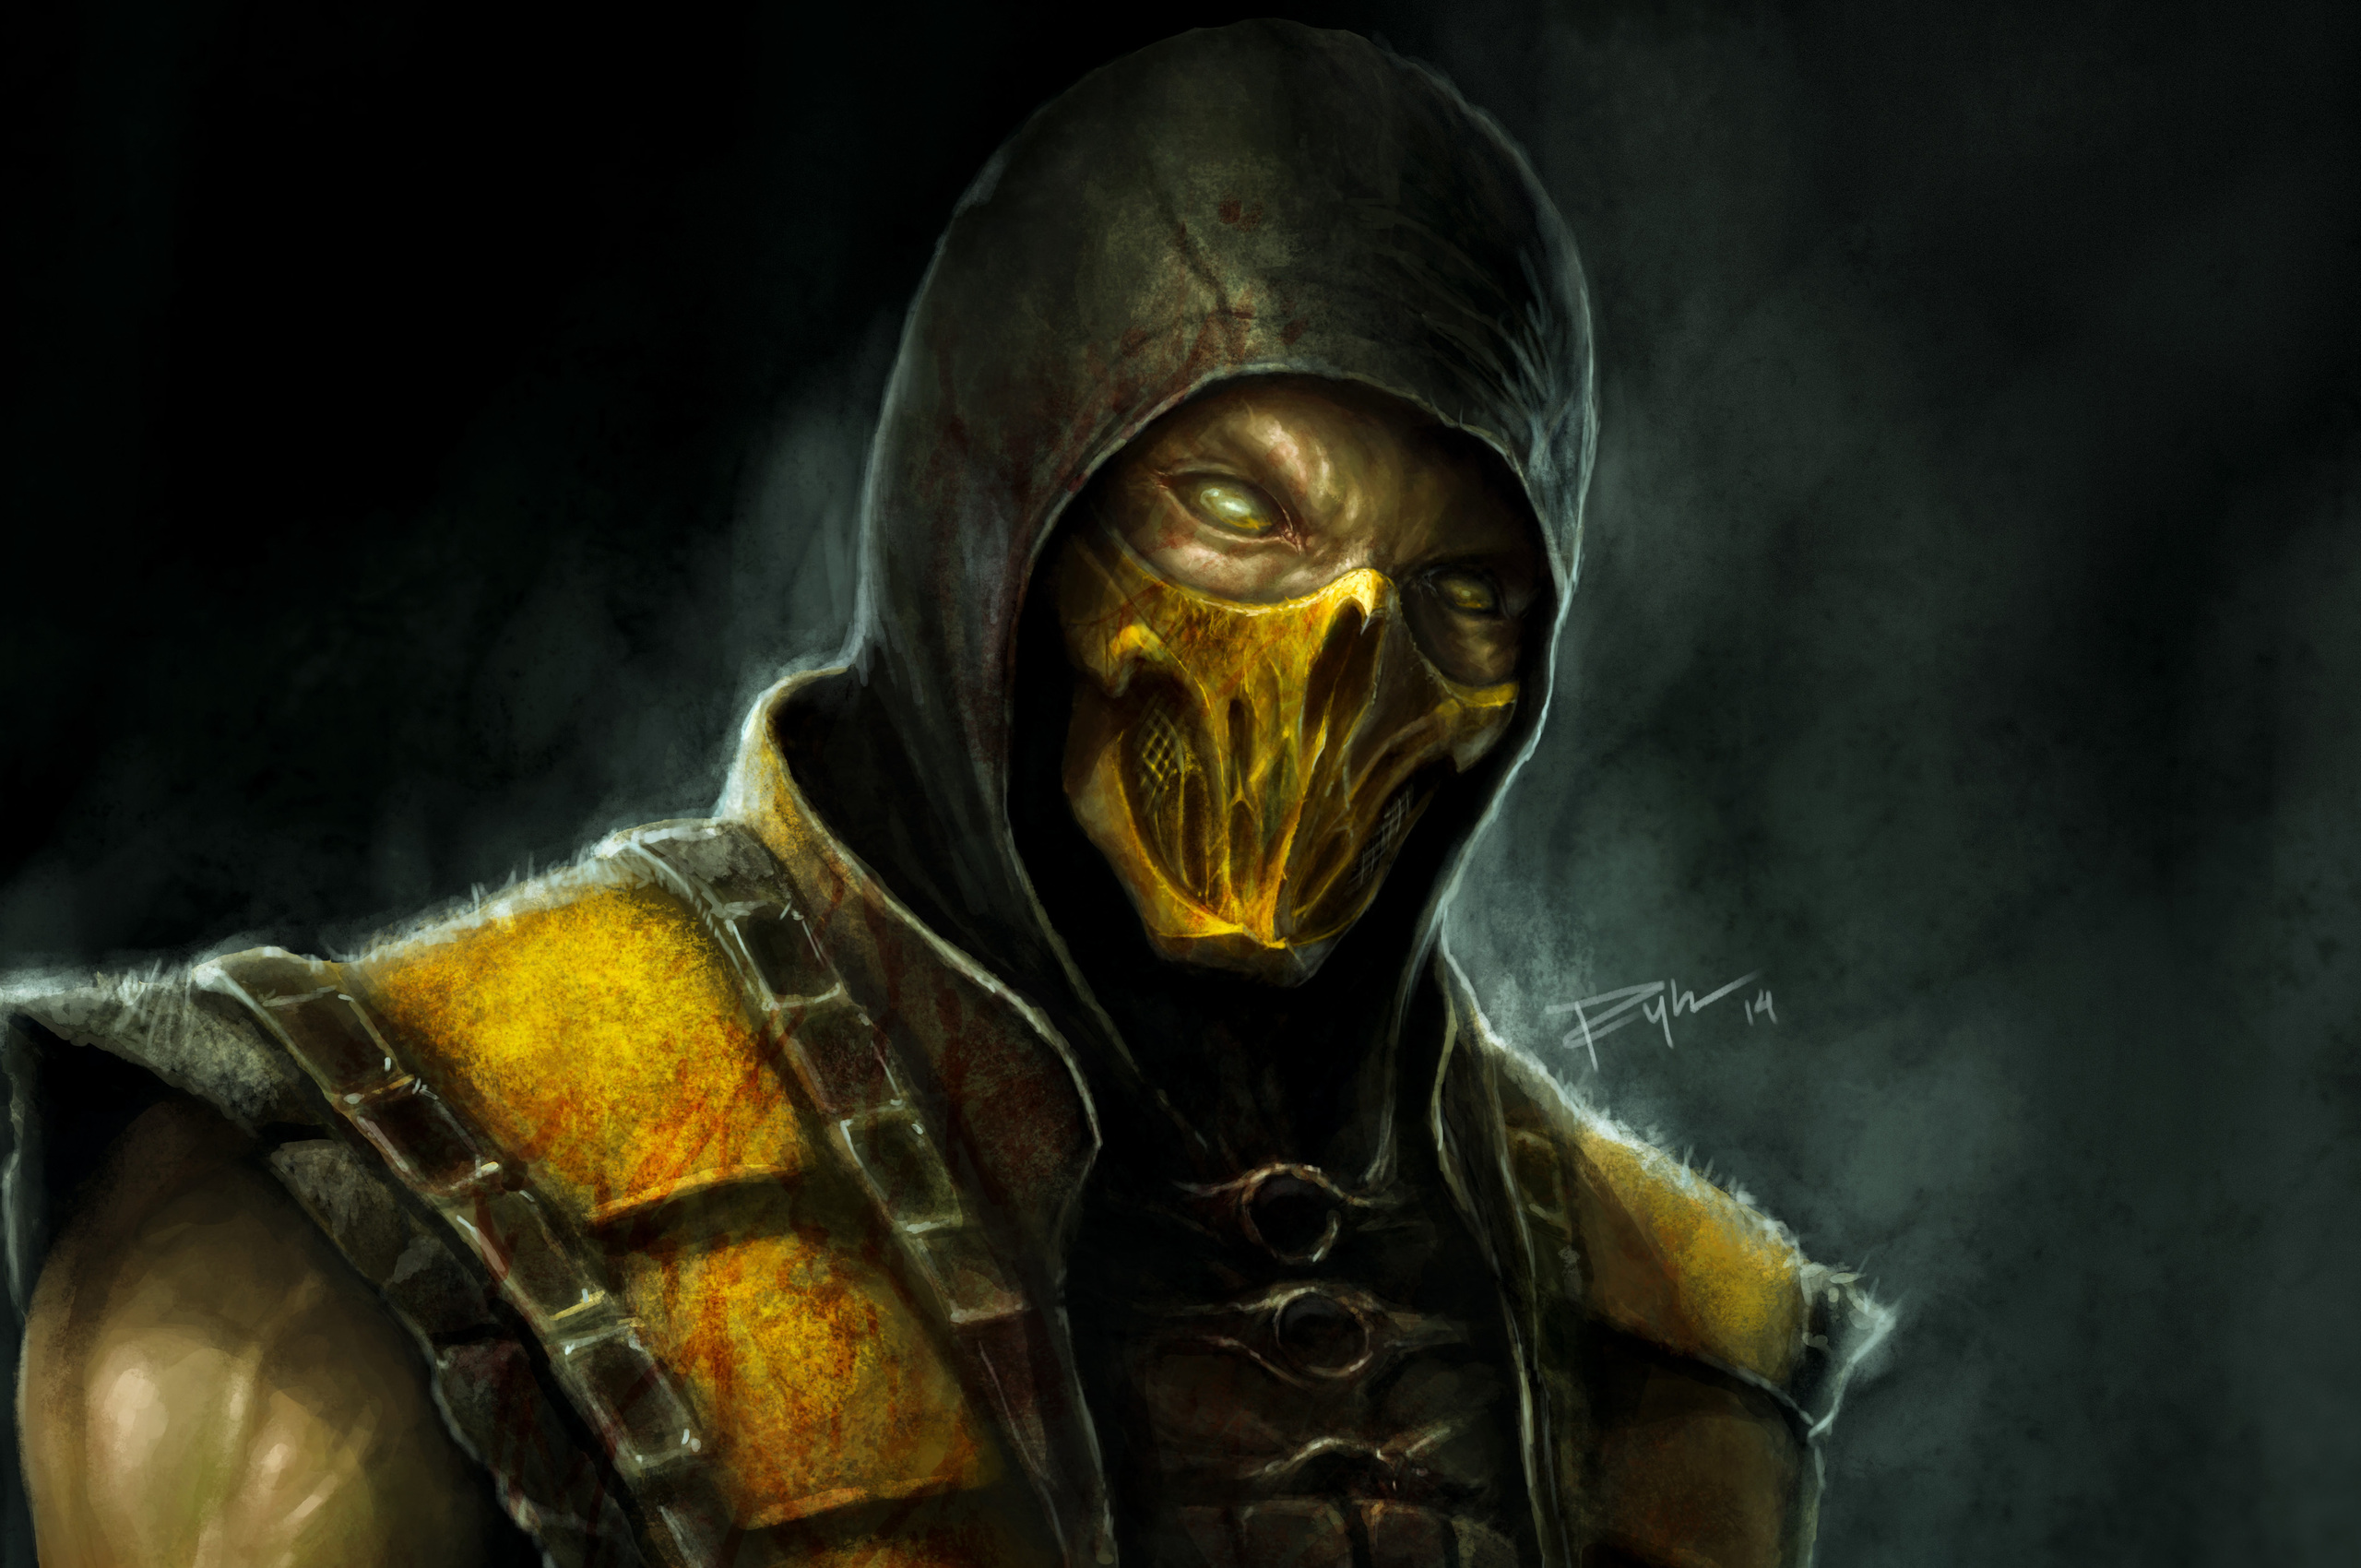 2560x1700 Scorpion Mortal Kombat X 4k Artwork Chromebook Pixel Hd